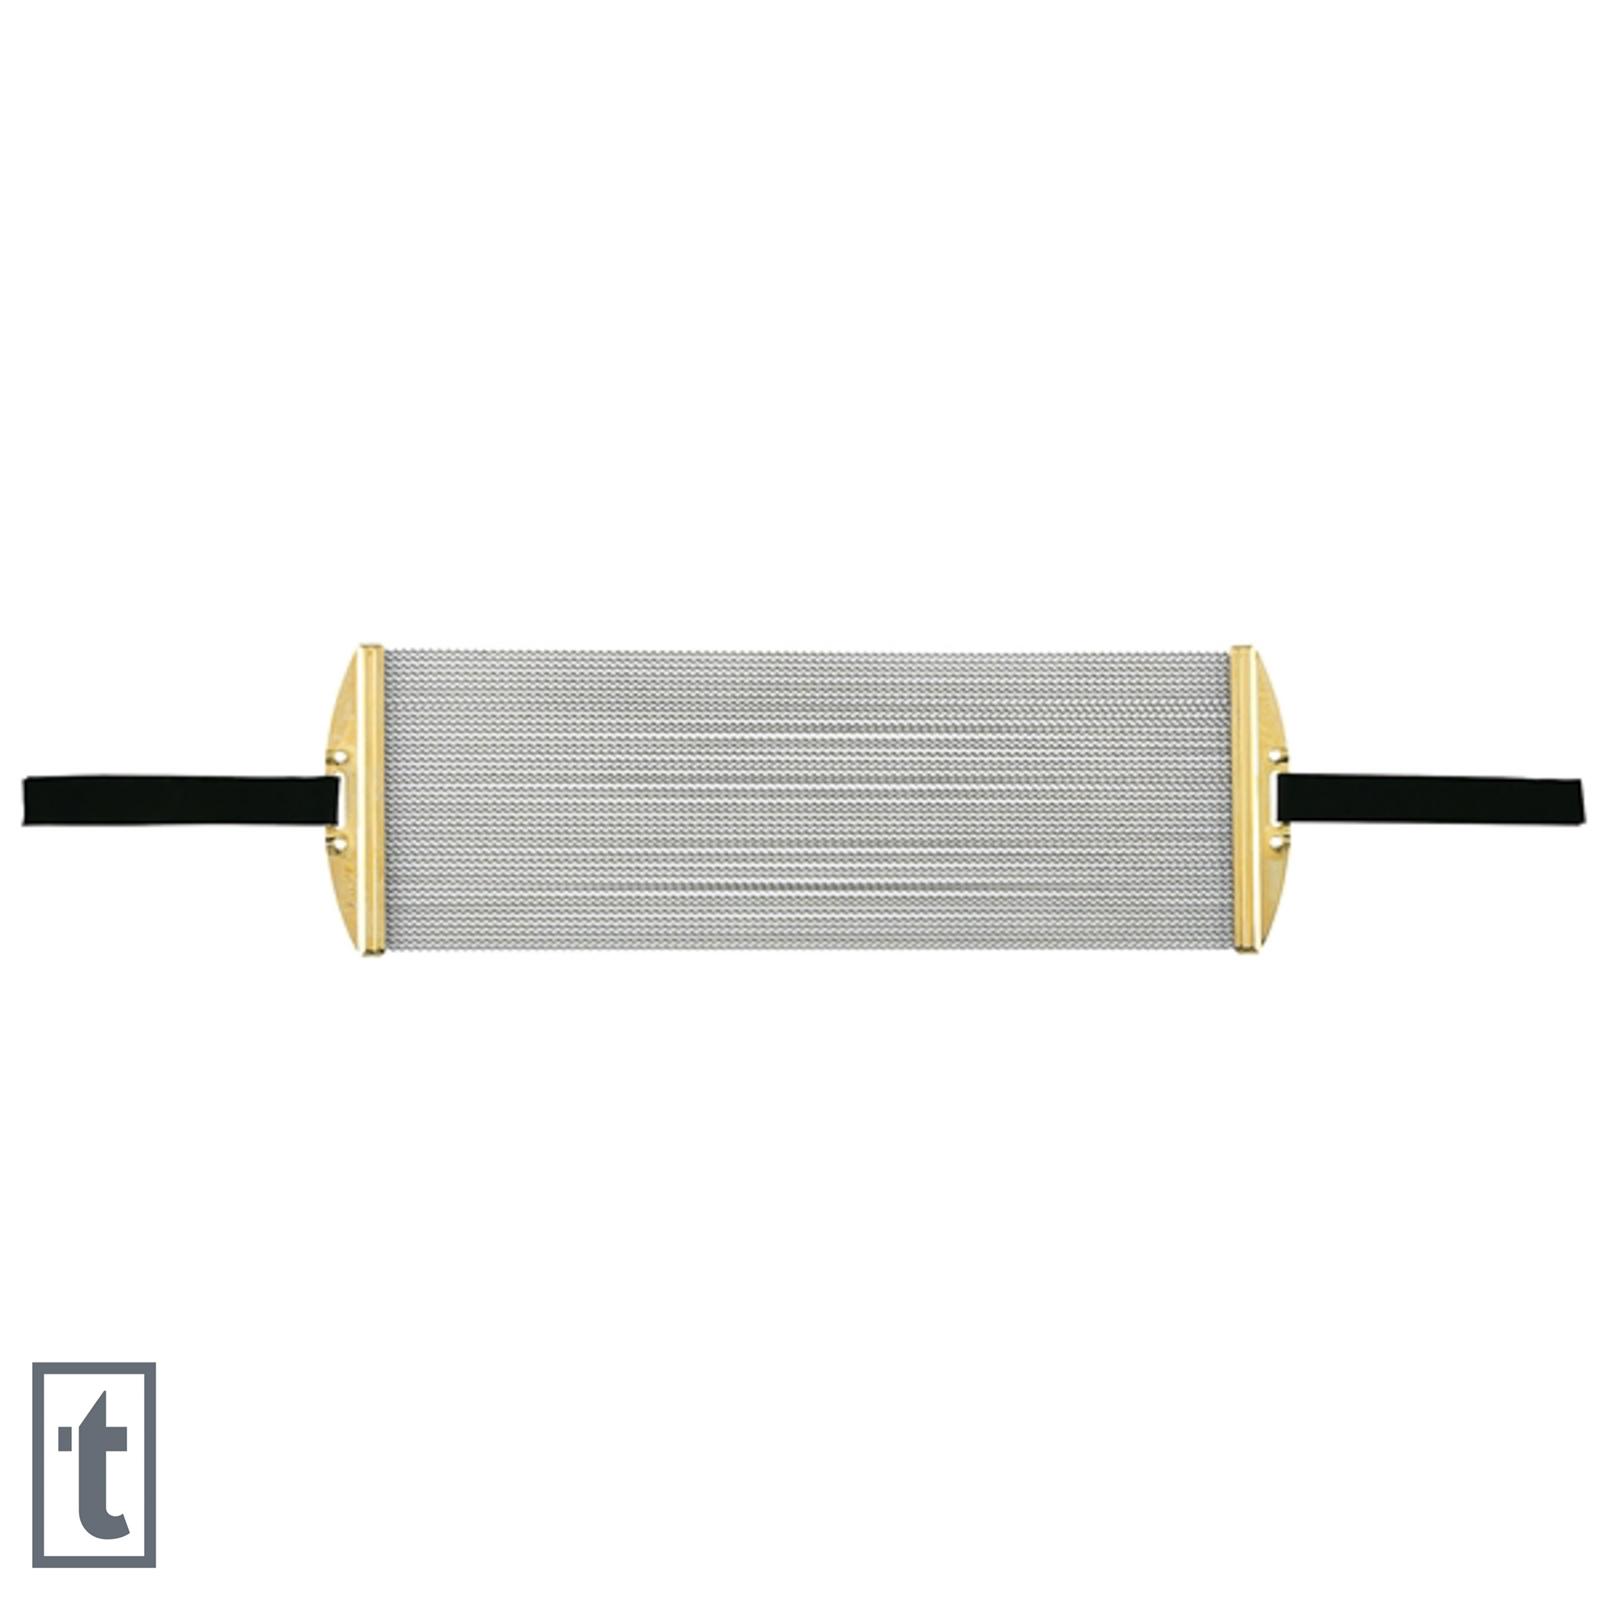 "Tama MS42R14C 14"" 42-strand Hi-Carbon Steel Regular Snare Wires - Esteira"